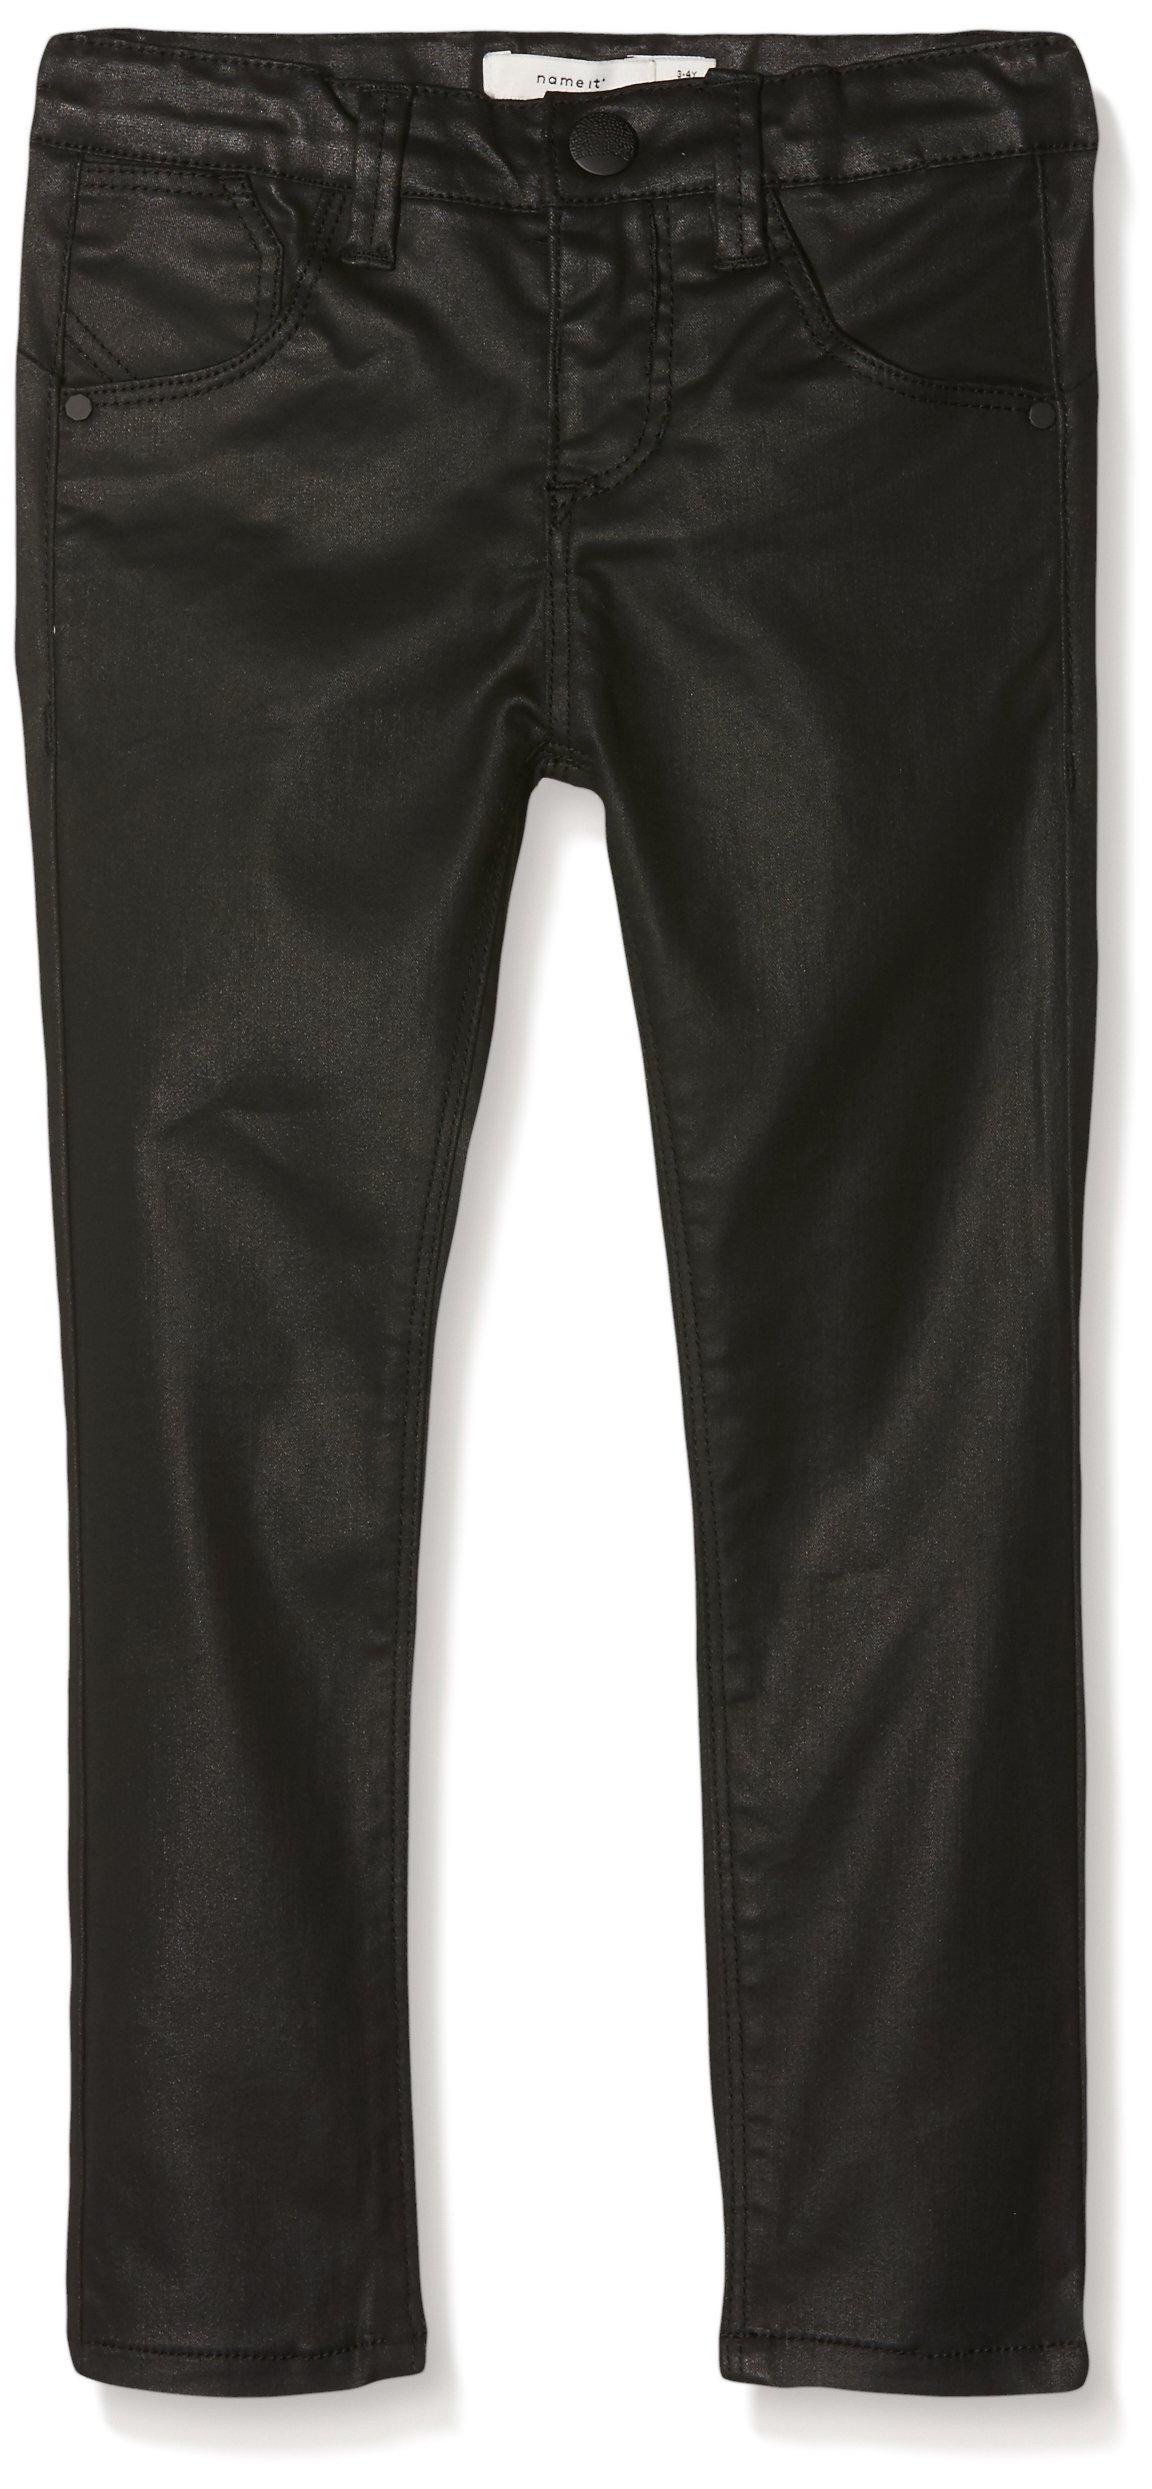 NAME IT Nitblosa Skinny TWI Pant F Mini Pantalones para Bebés 1